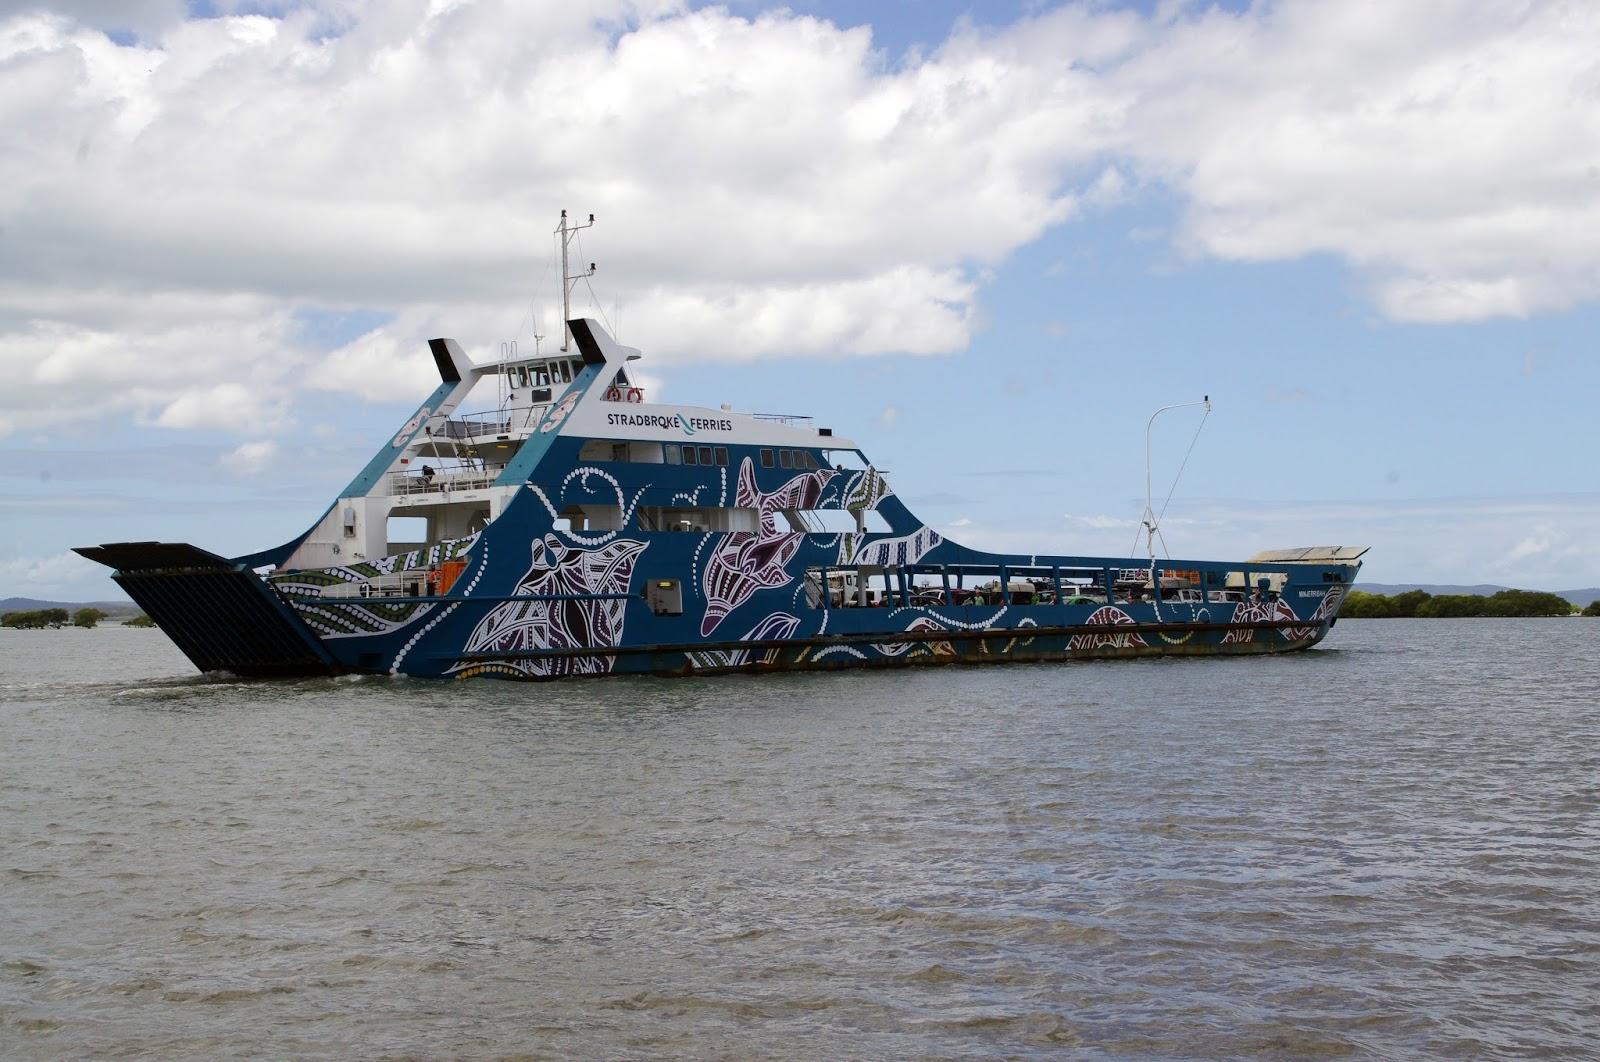 Stradbroke Island Ferries